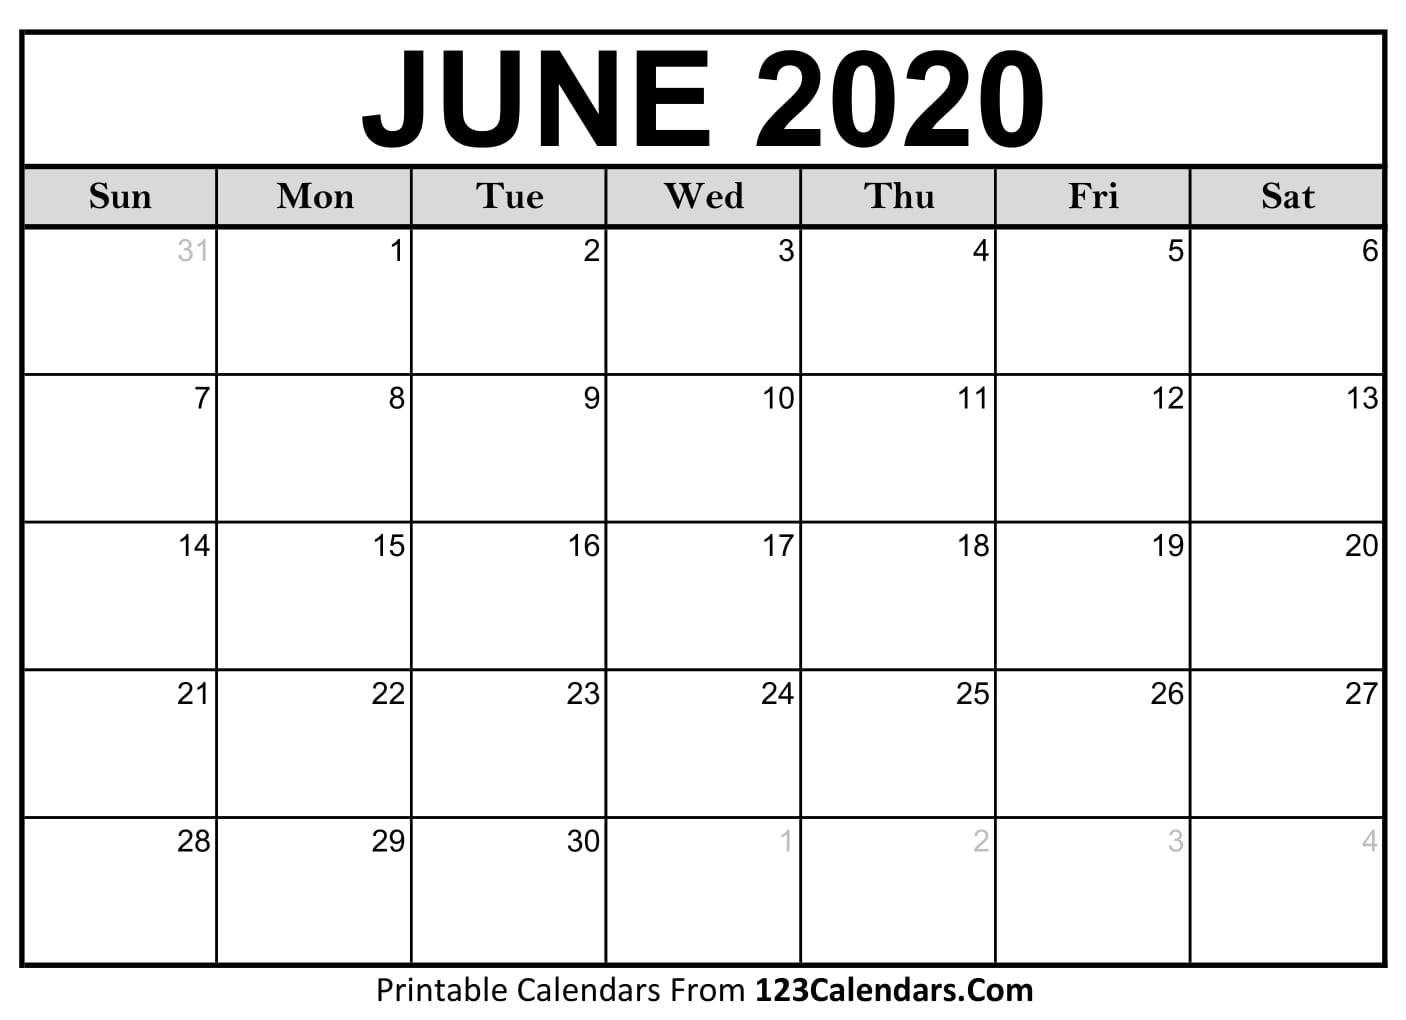 June 2020 Printable Calendar | 123Calendars